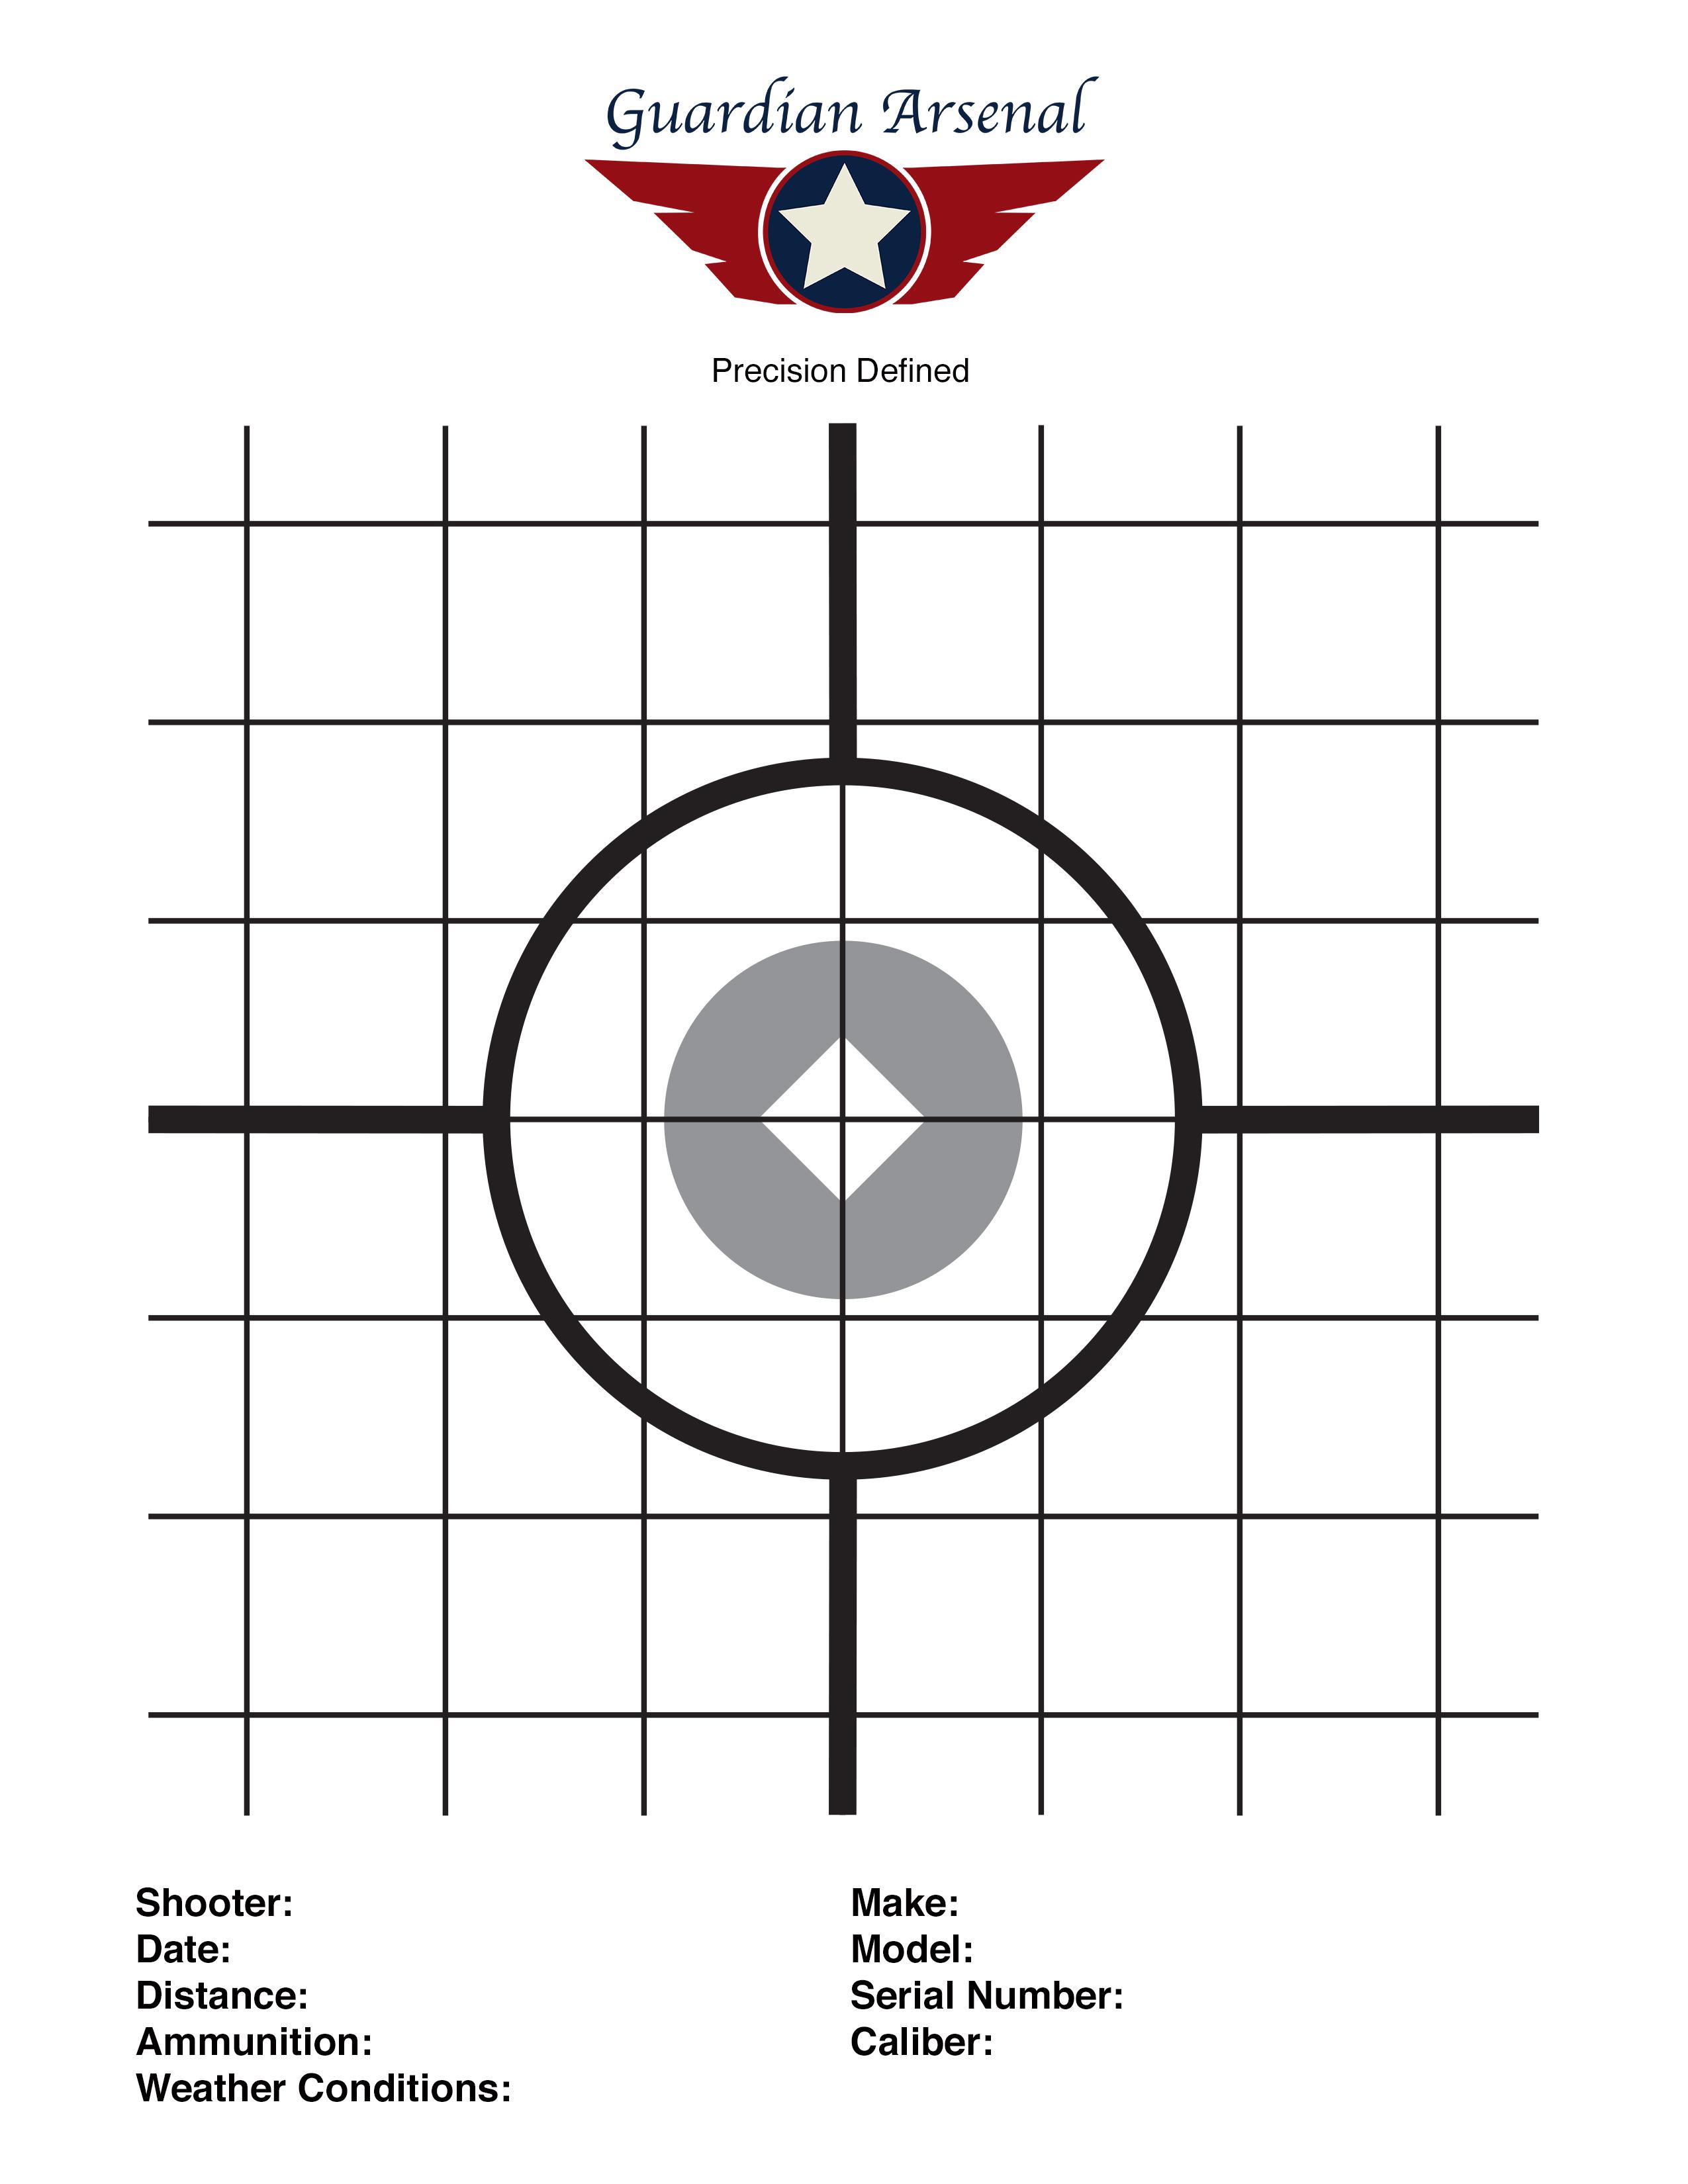 Guardian Arsenal Target